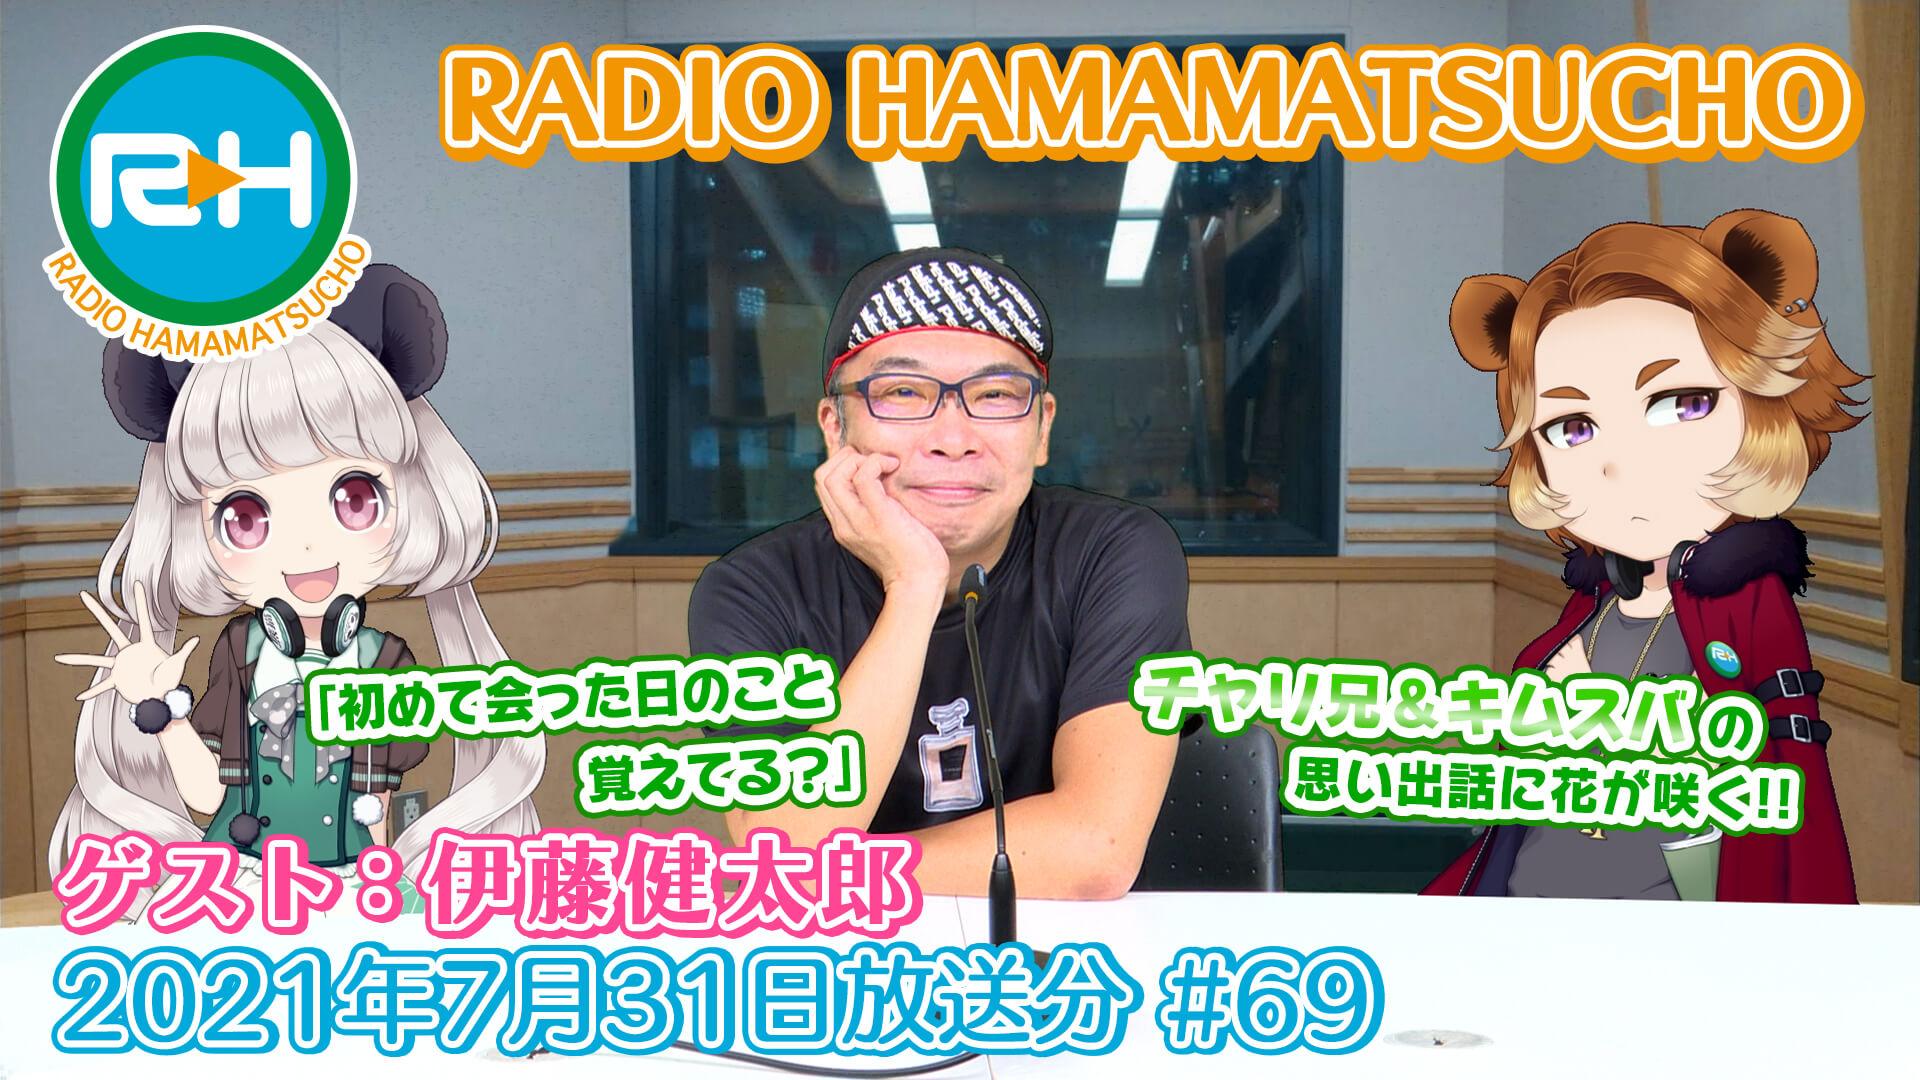 RADIO HAMAMATSUCHO 第69回 (2021年7月31日放送分) ゲスト: 伊藤健太郎